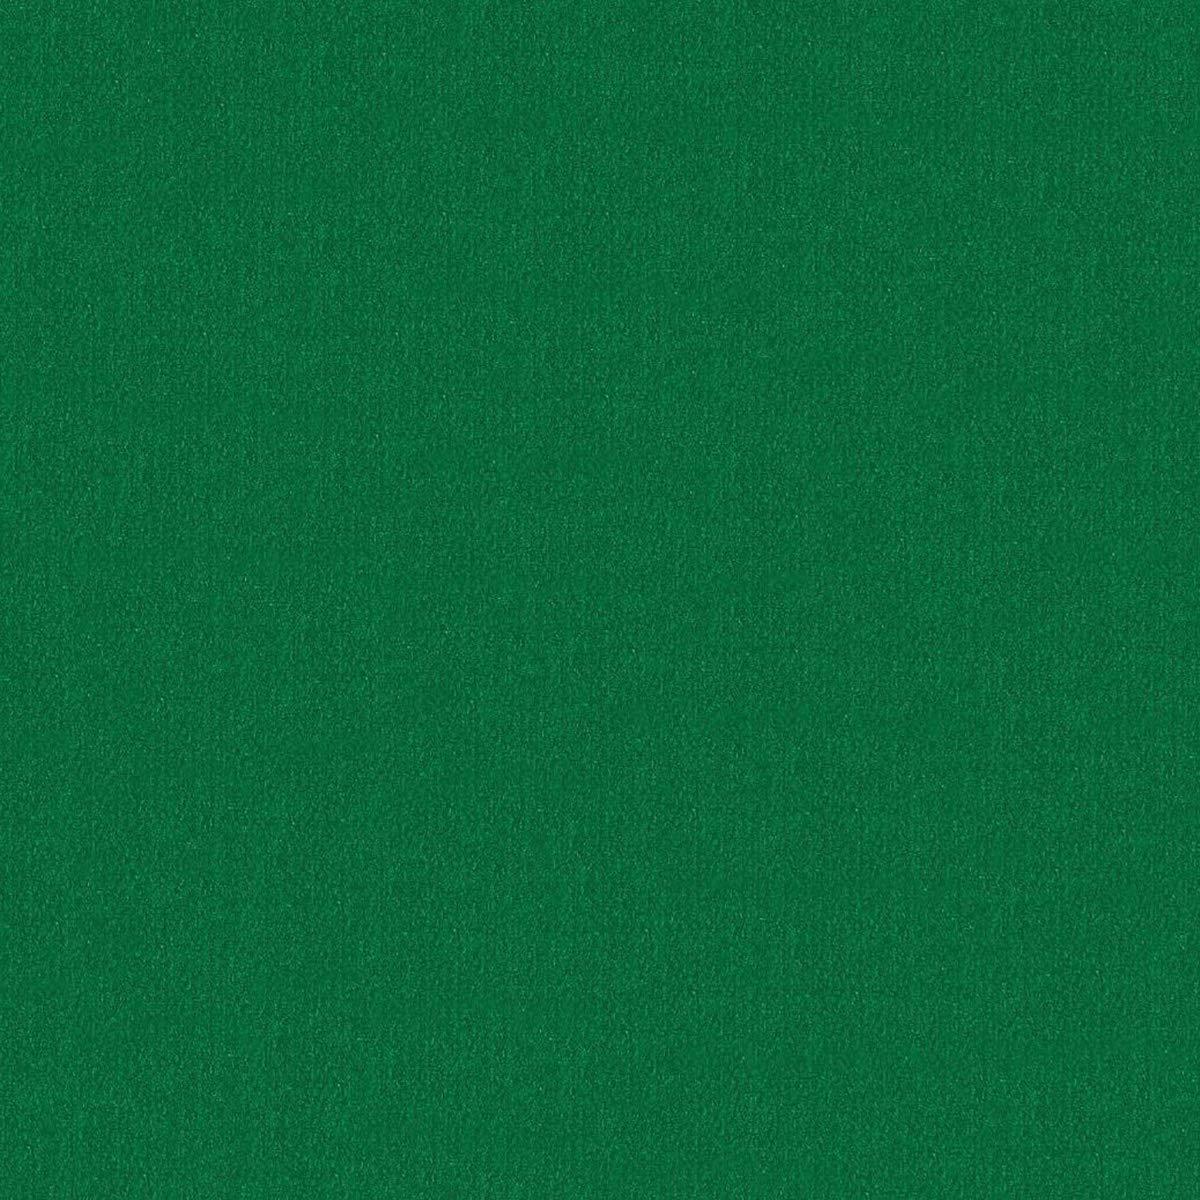 Championship Green 8ft Pool Table Felt